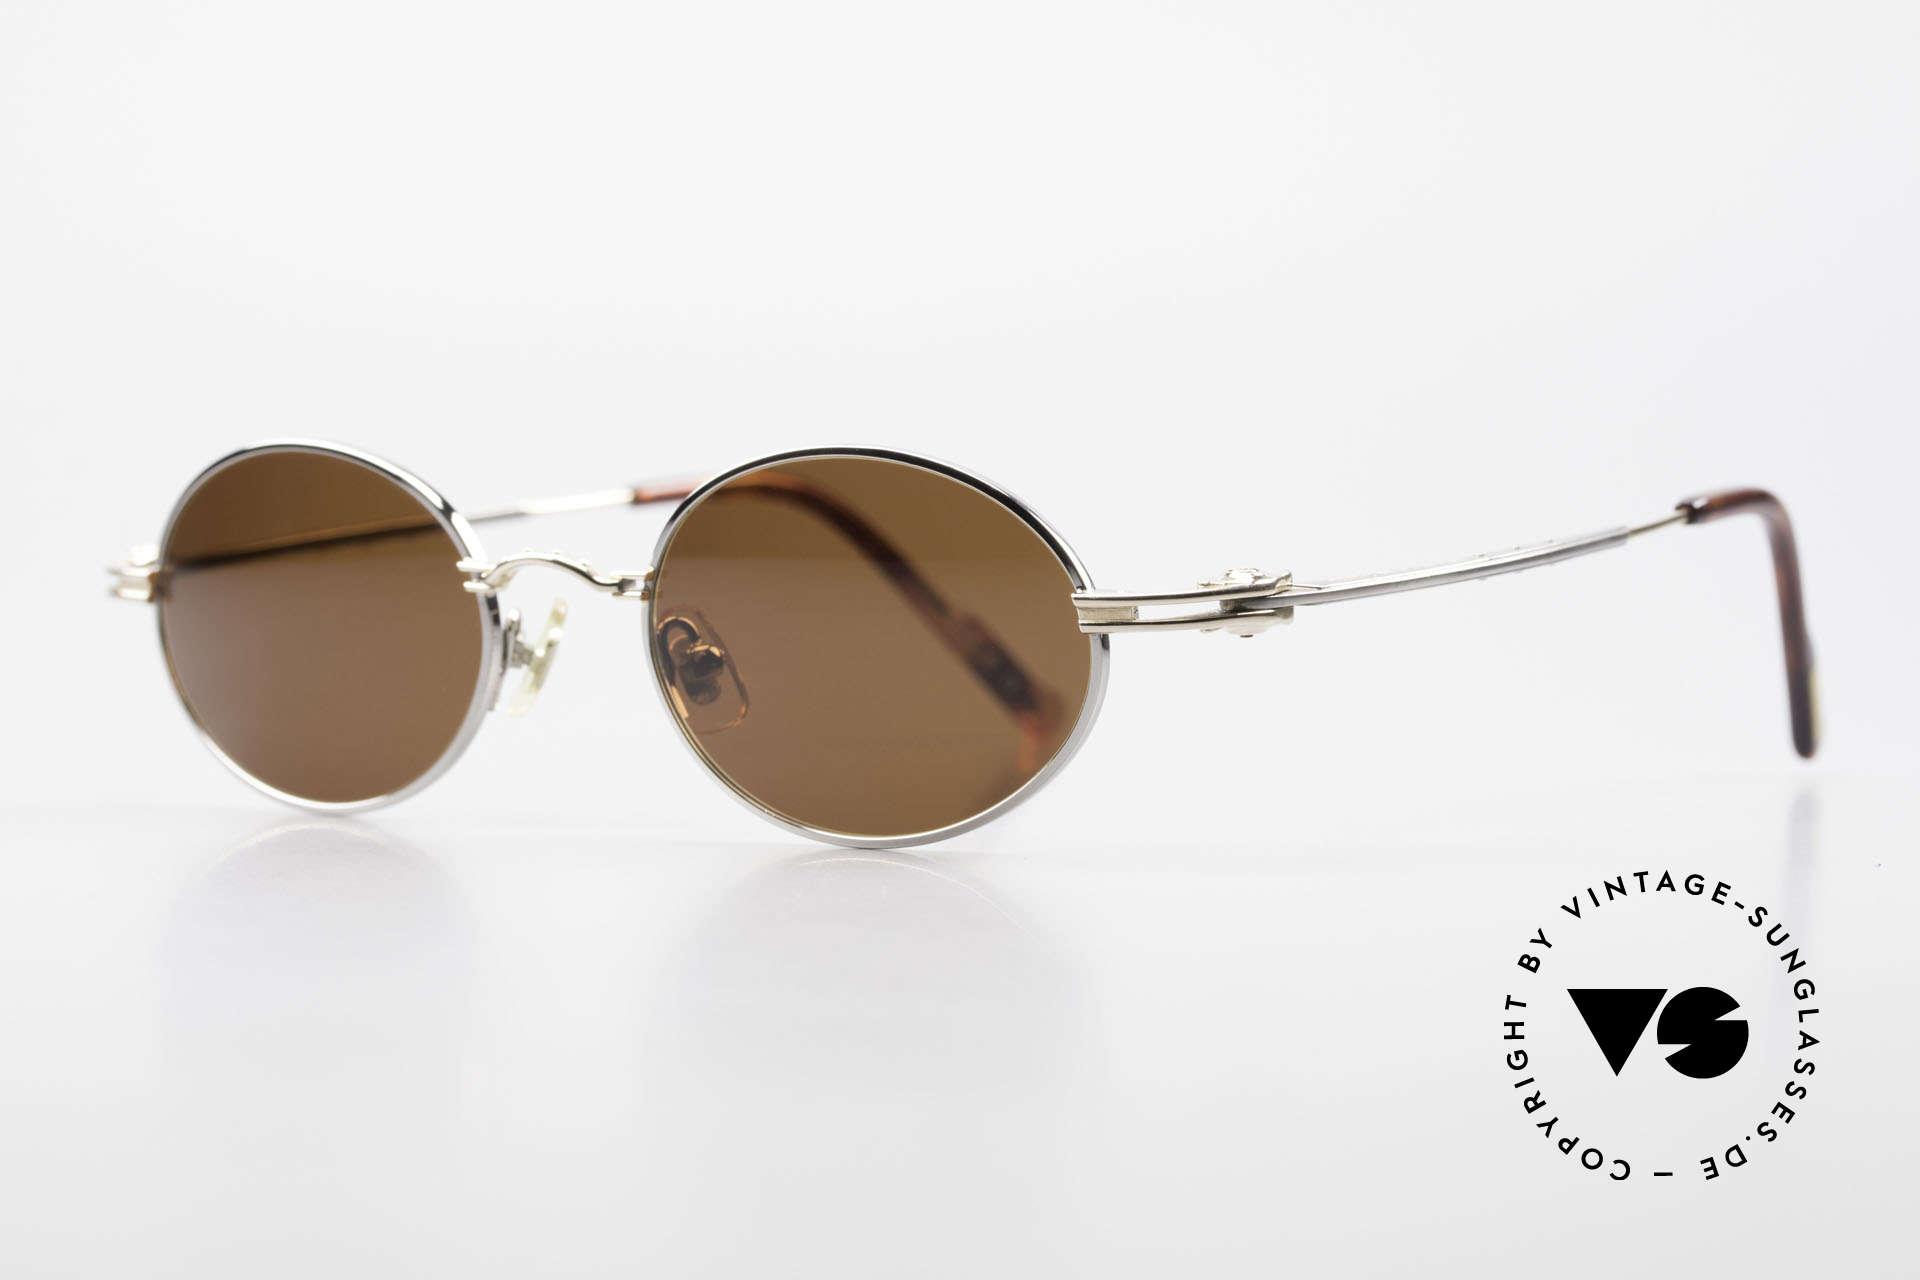 Aston Martin AM43 Ergonomic Oval Sunglasses, sporty and elegant classic: James Bond 'gentlemen style', Made for Men